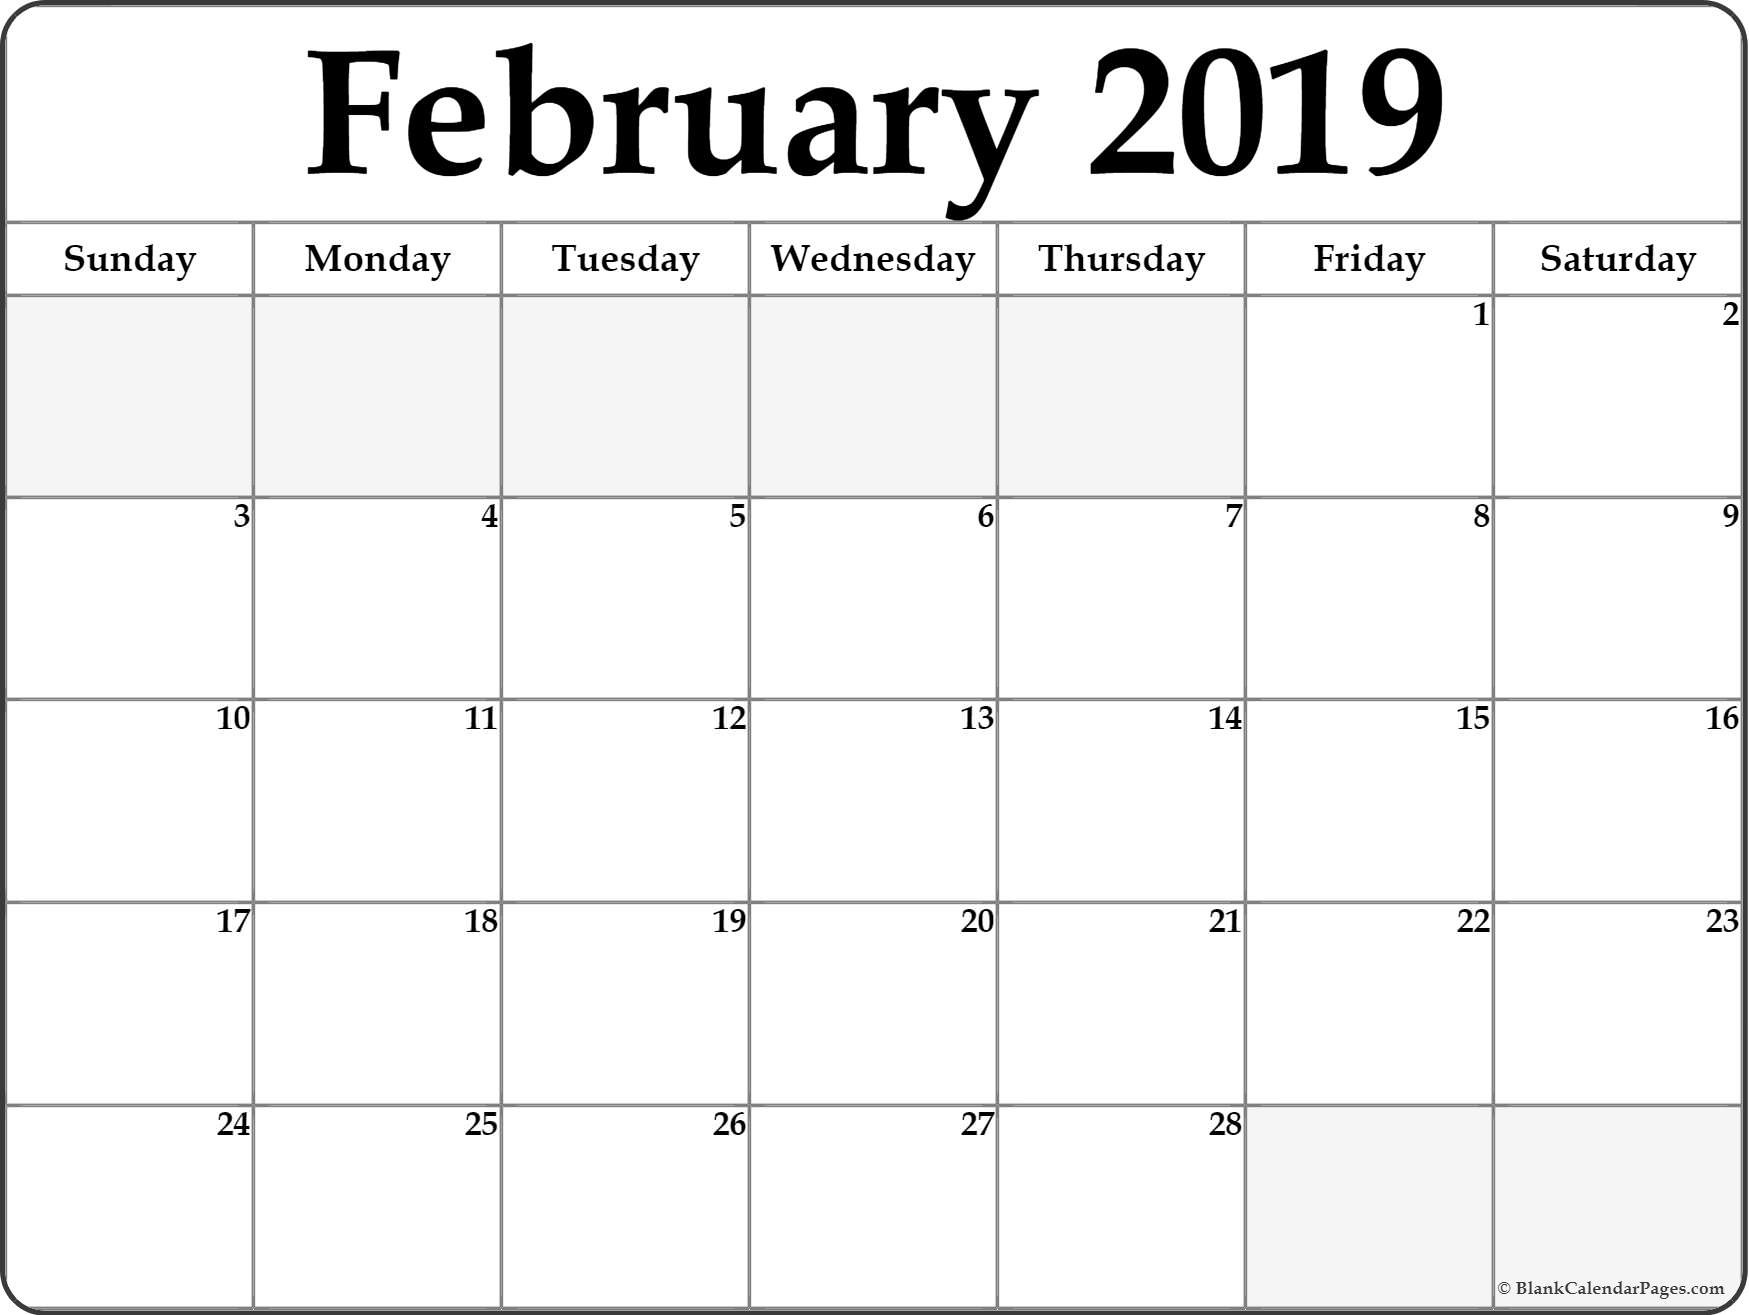 51 Free February 2019 Printable Calendar Templates PDF